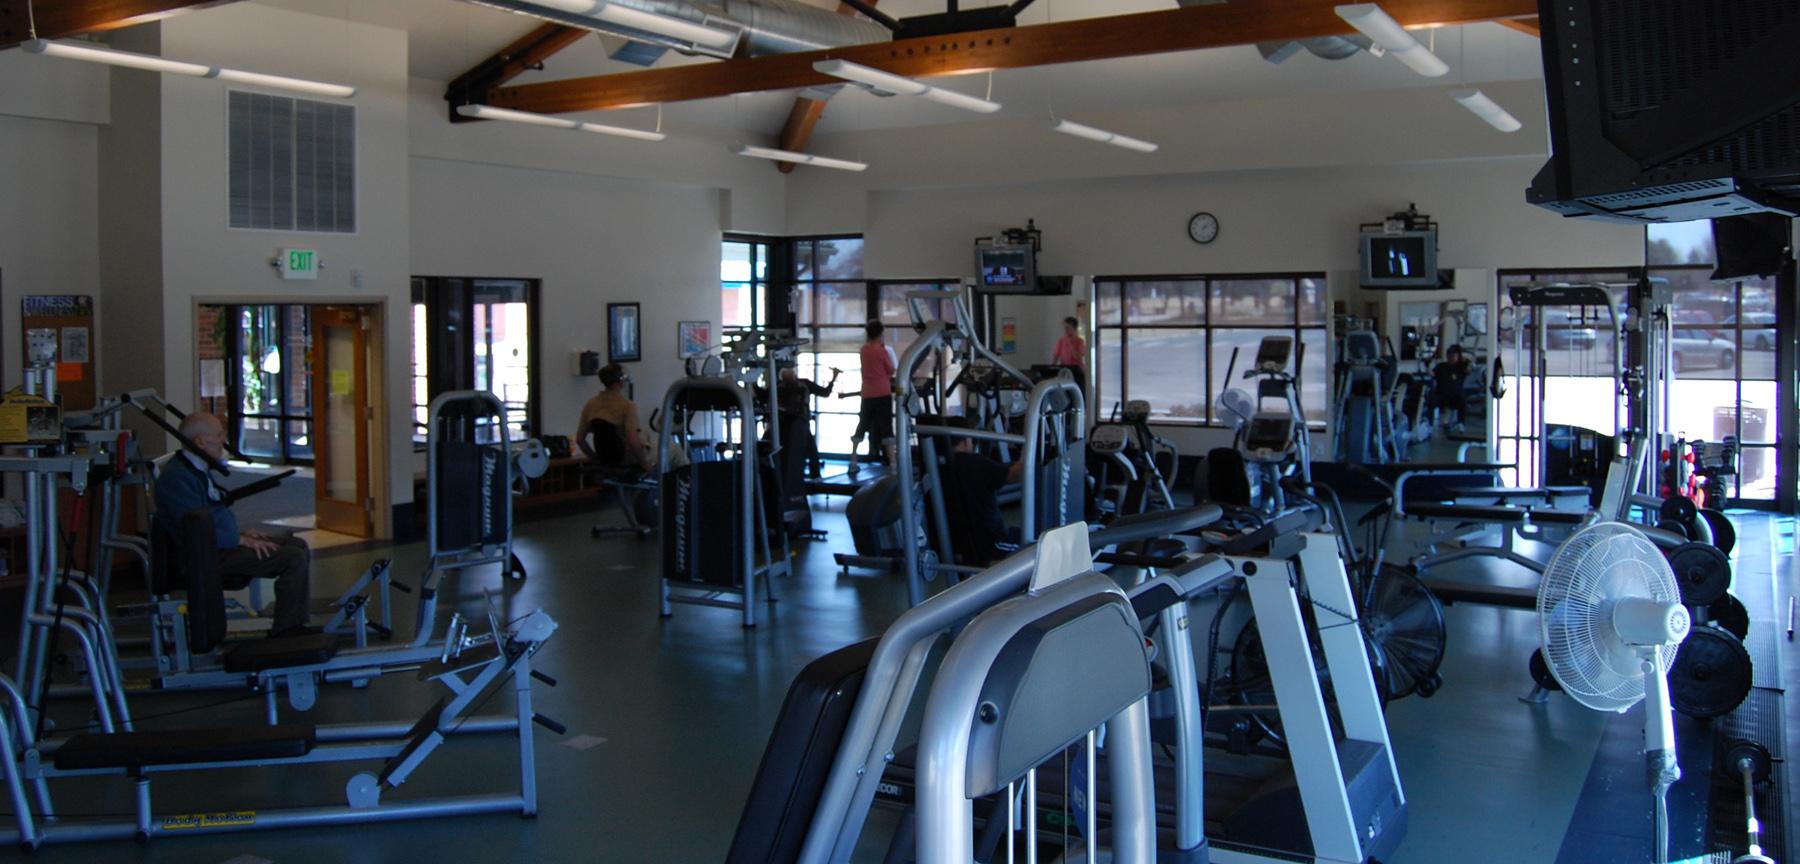 Aurora Senior Center fitness room